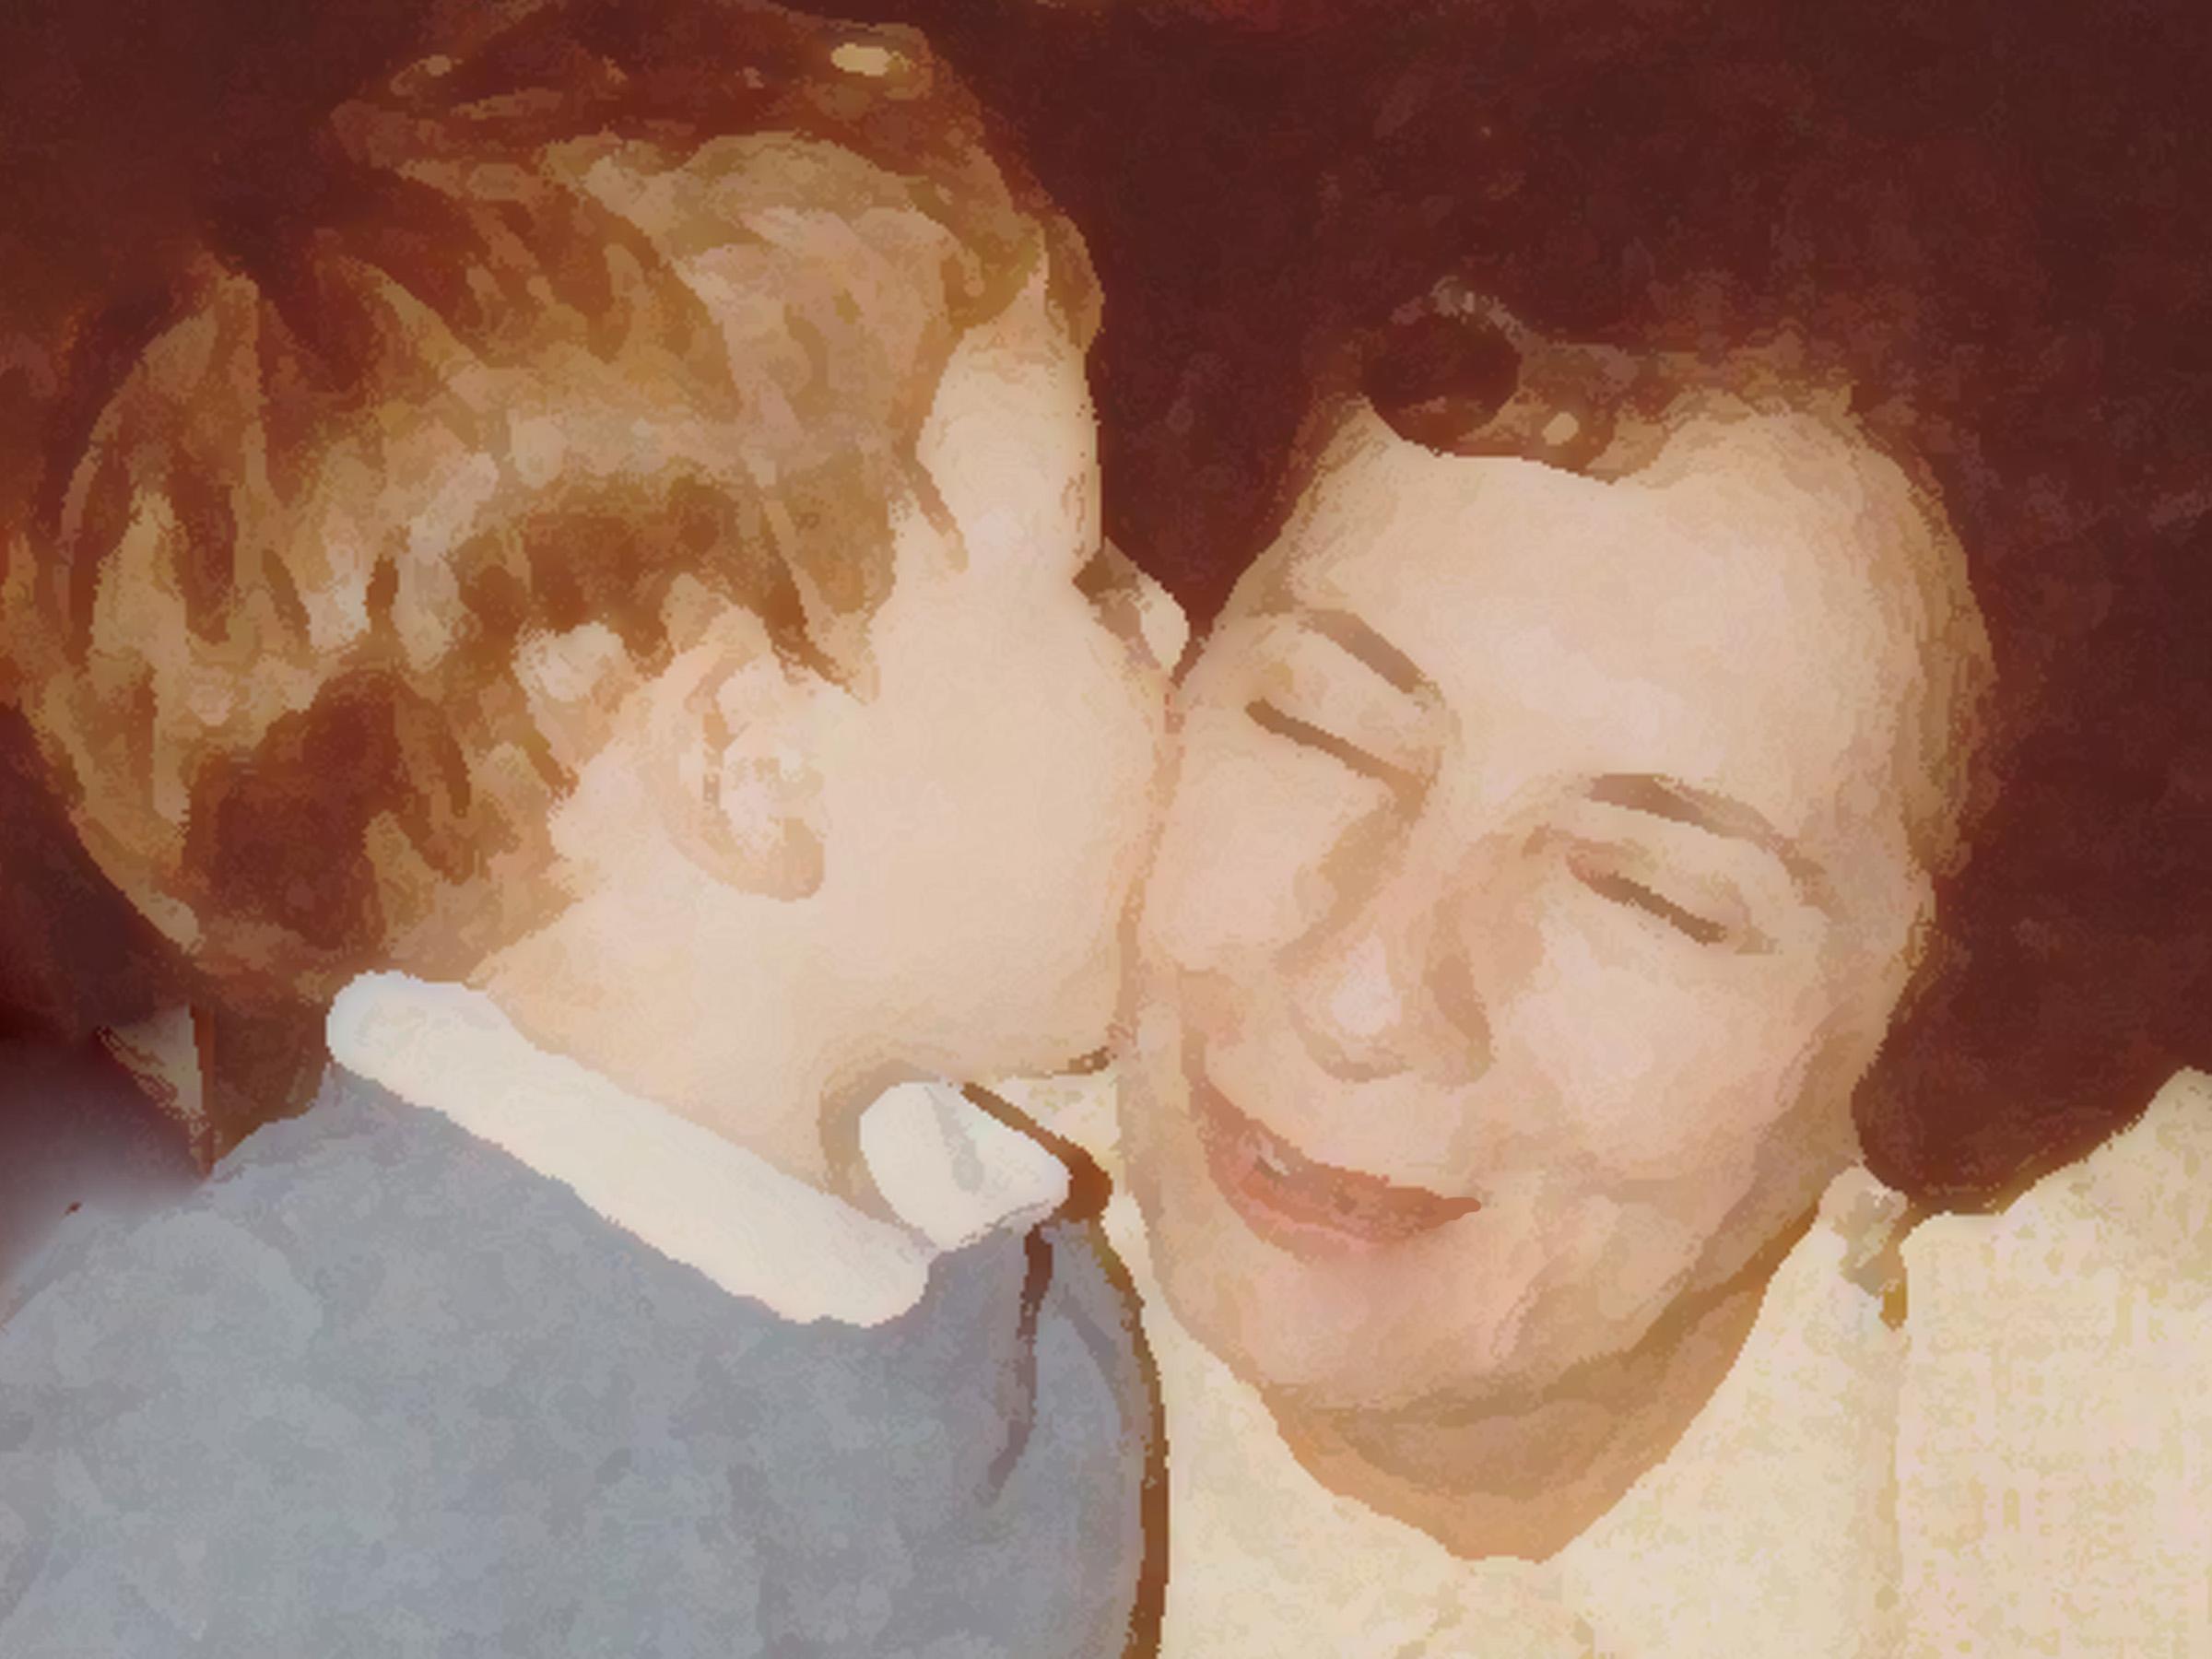 Pelican Family Series Children's Picture Books Connect Your Grandchildren Blog Post Grandma and Grandson image